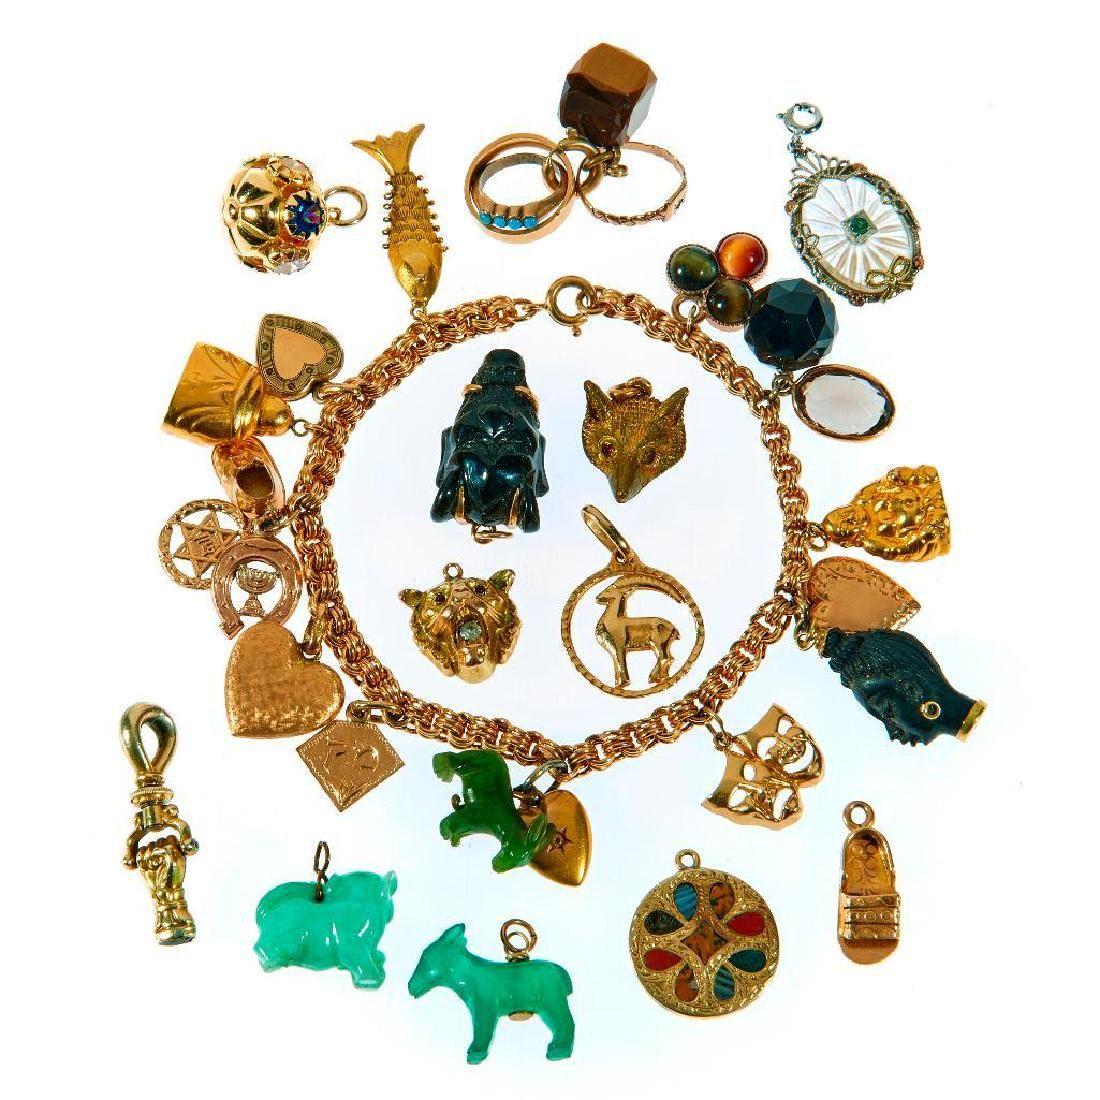 18k Gold bracelet with charms